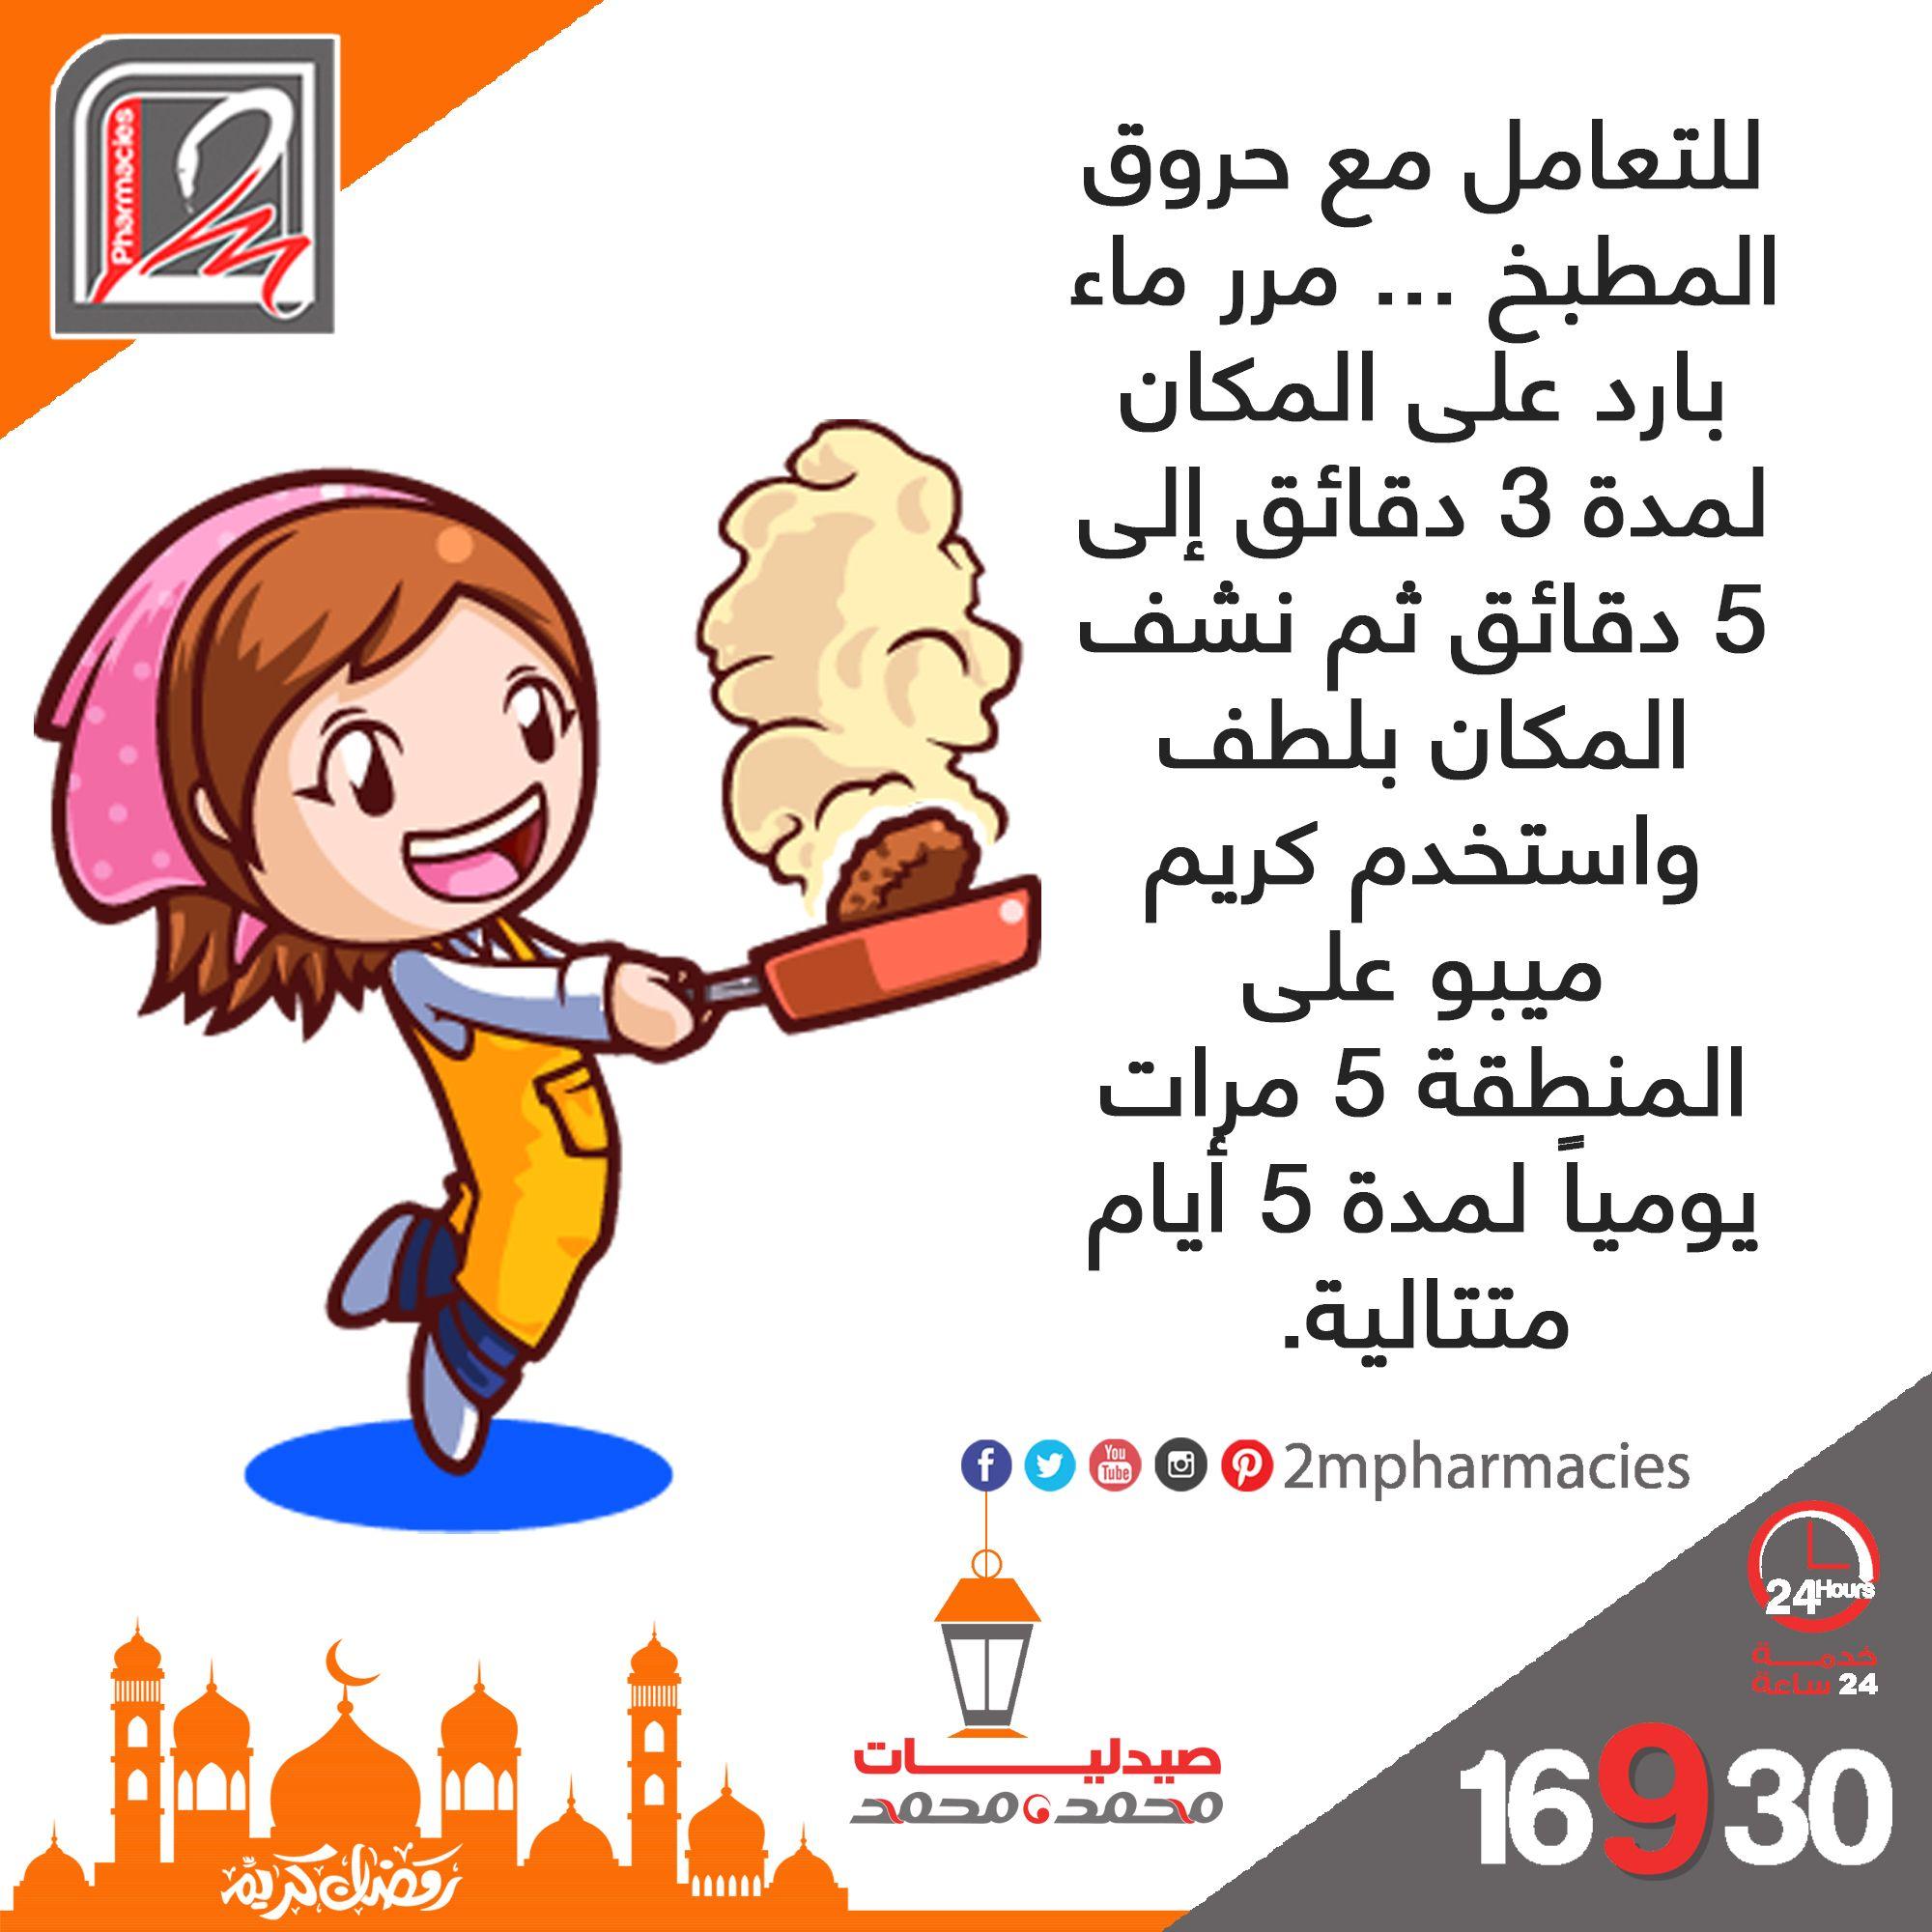 Pin By Mohmmed Mohmmed Pharmacies On Health In Ramadan الصحة في رمضان Bal Comics Medical